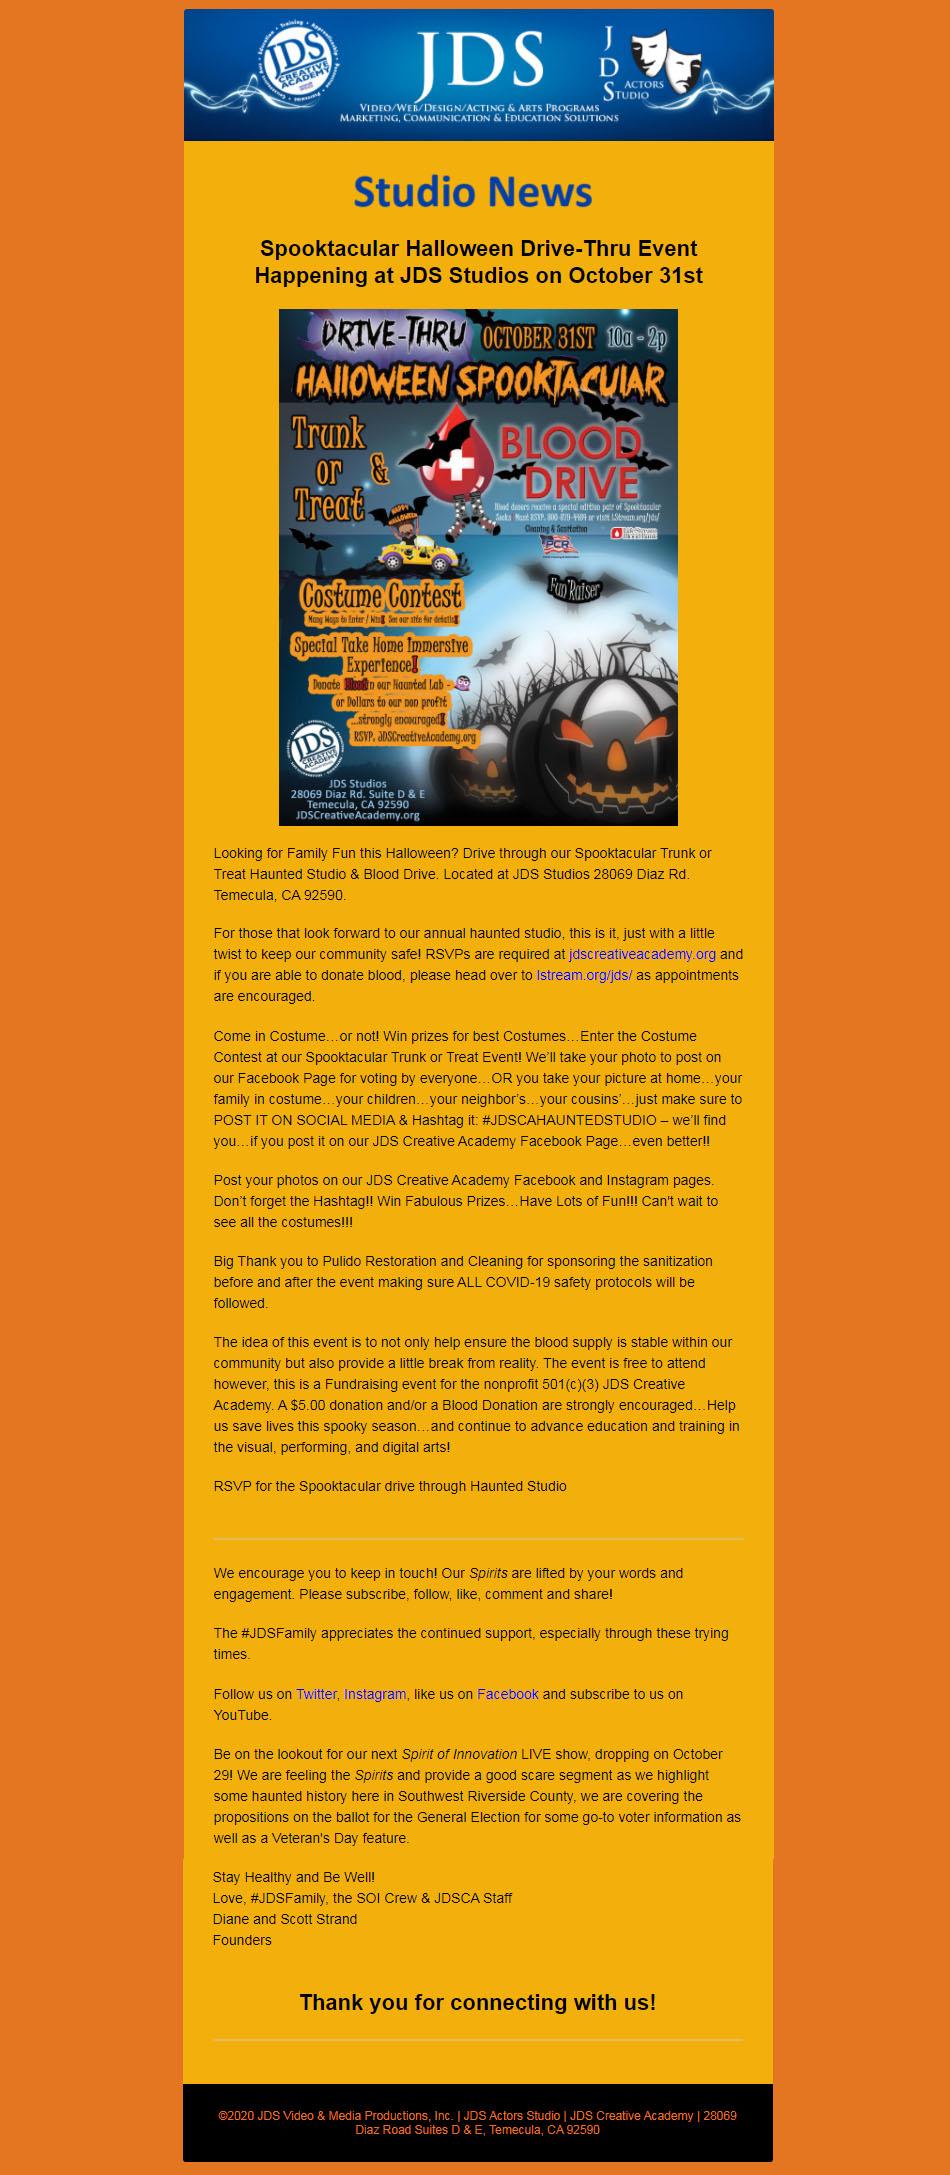 JDS Studio News Halloween Spooktacular Event